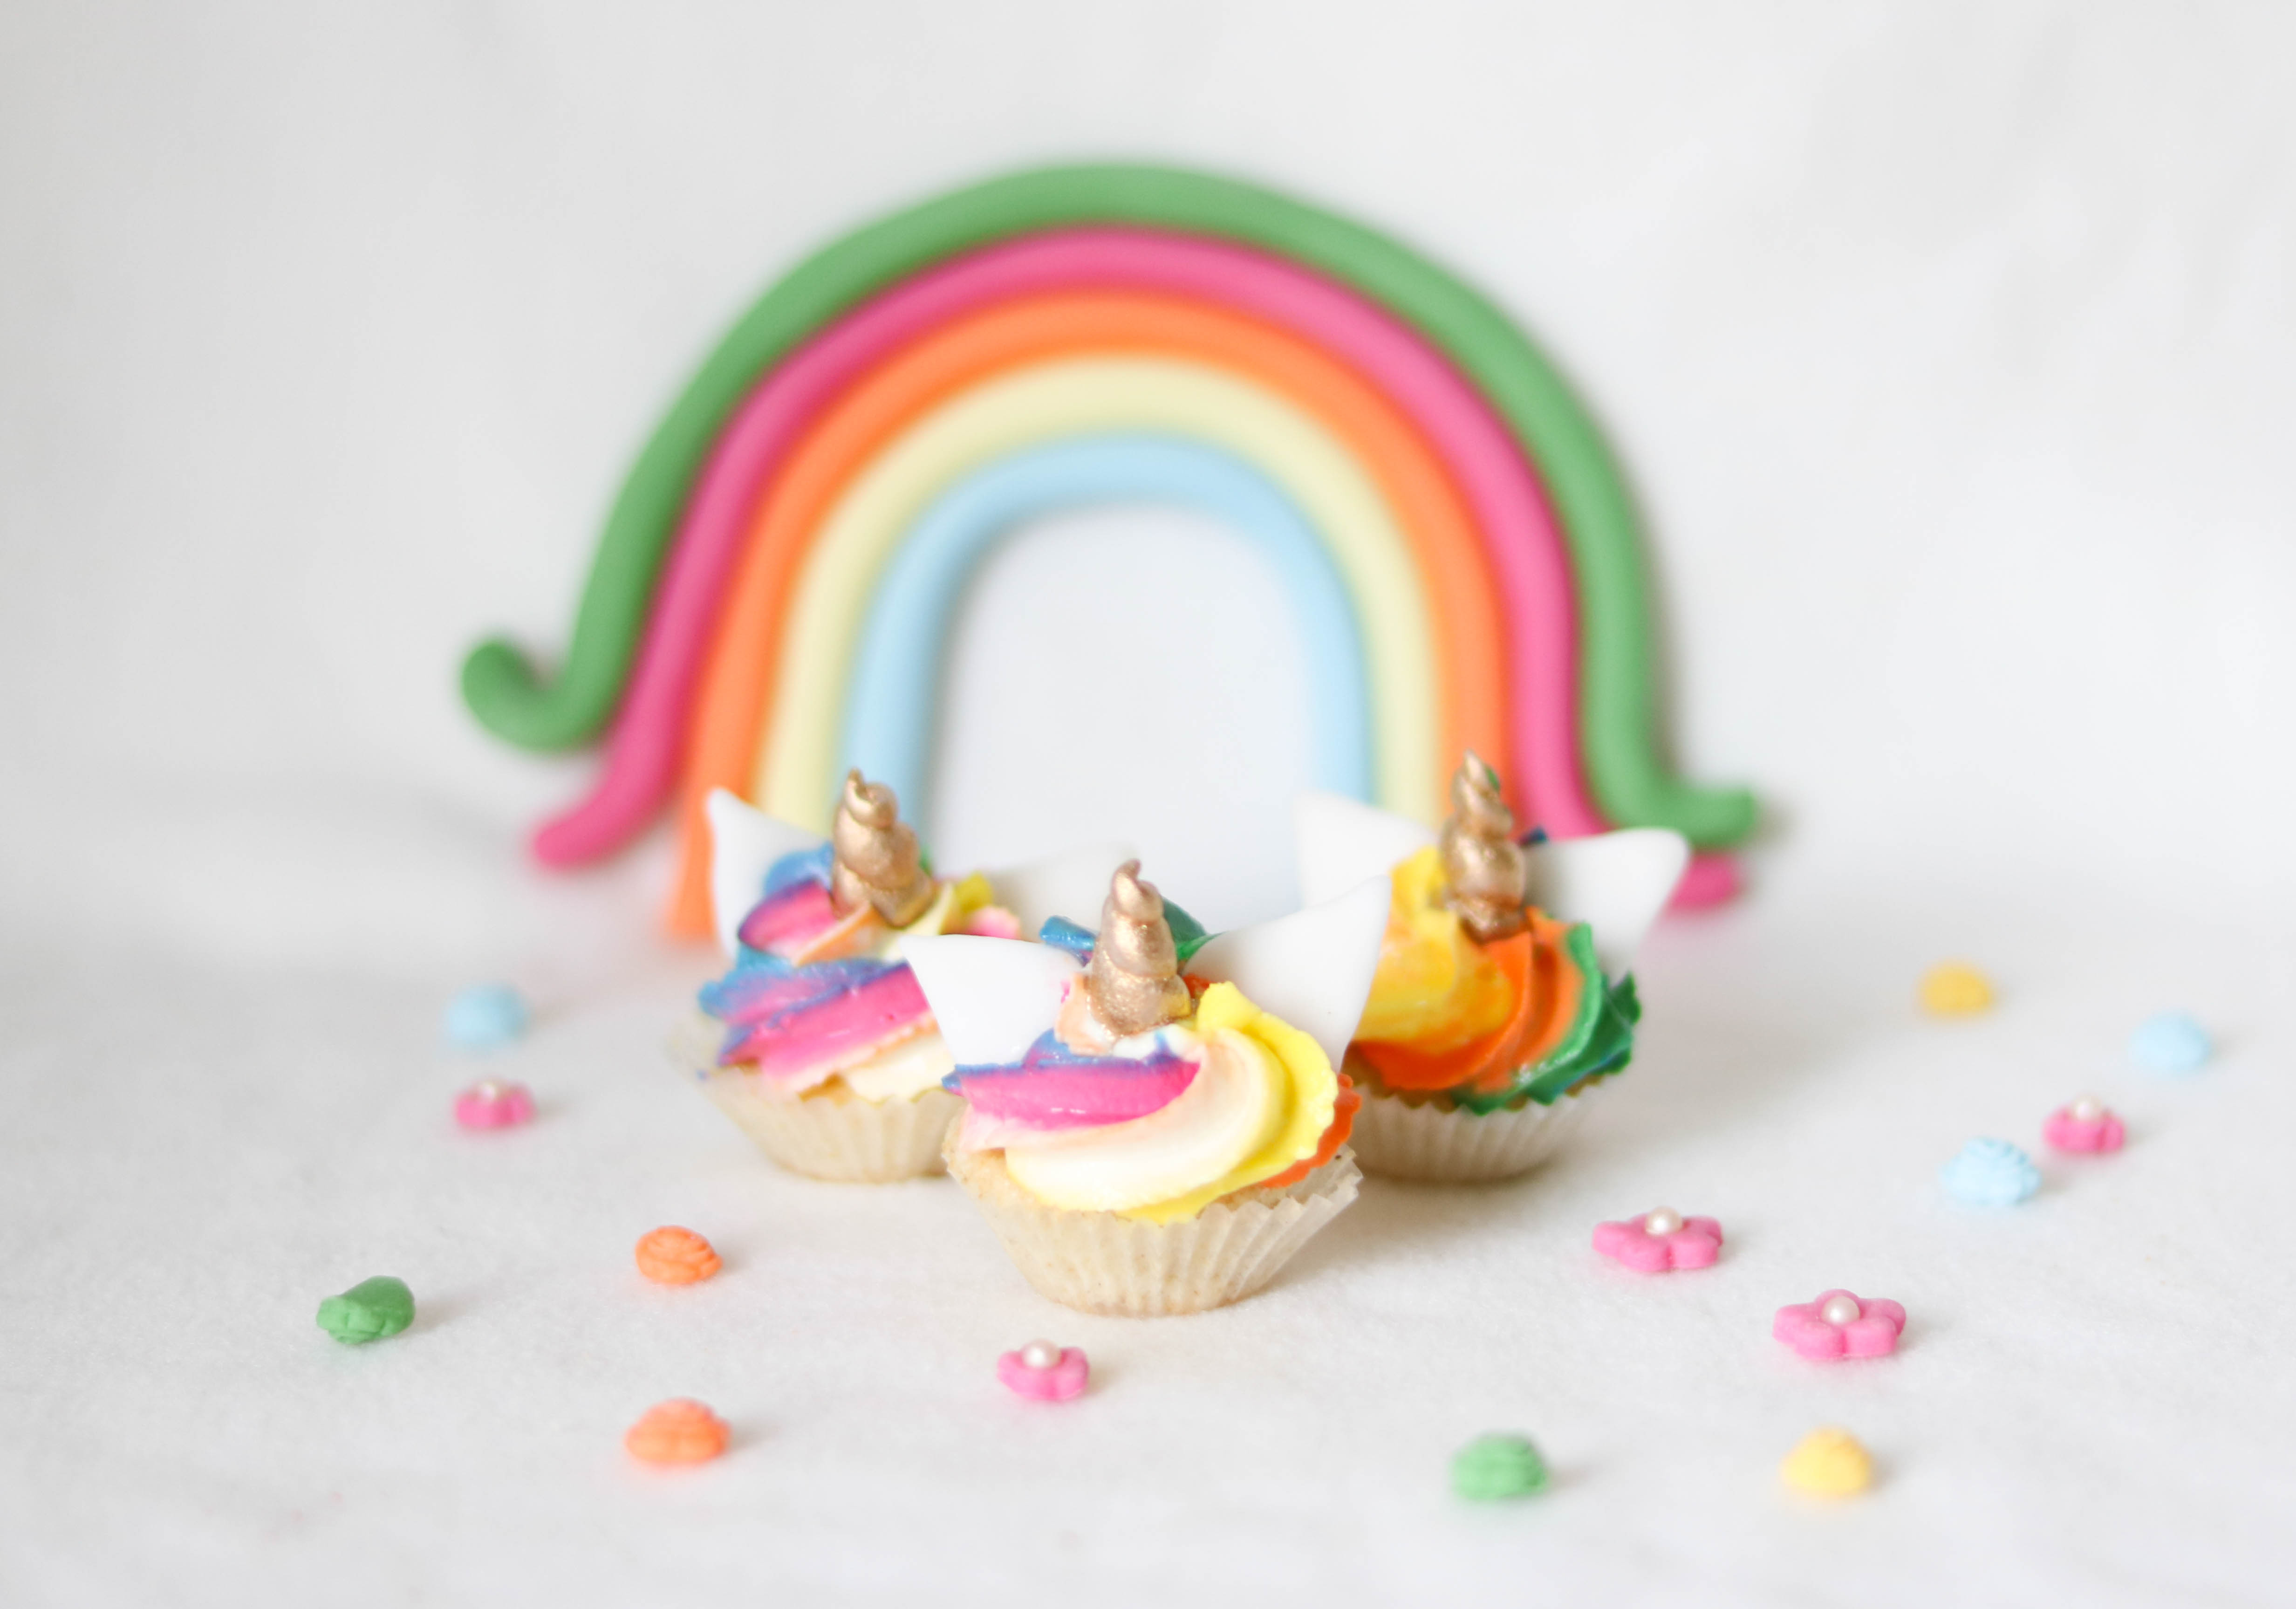 Einhorncupcakes